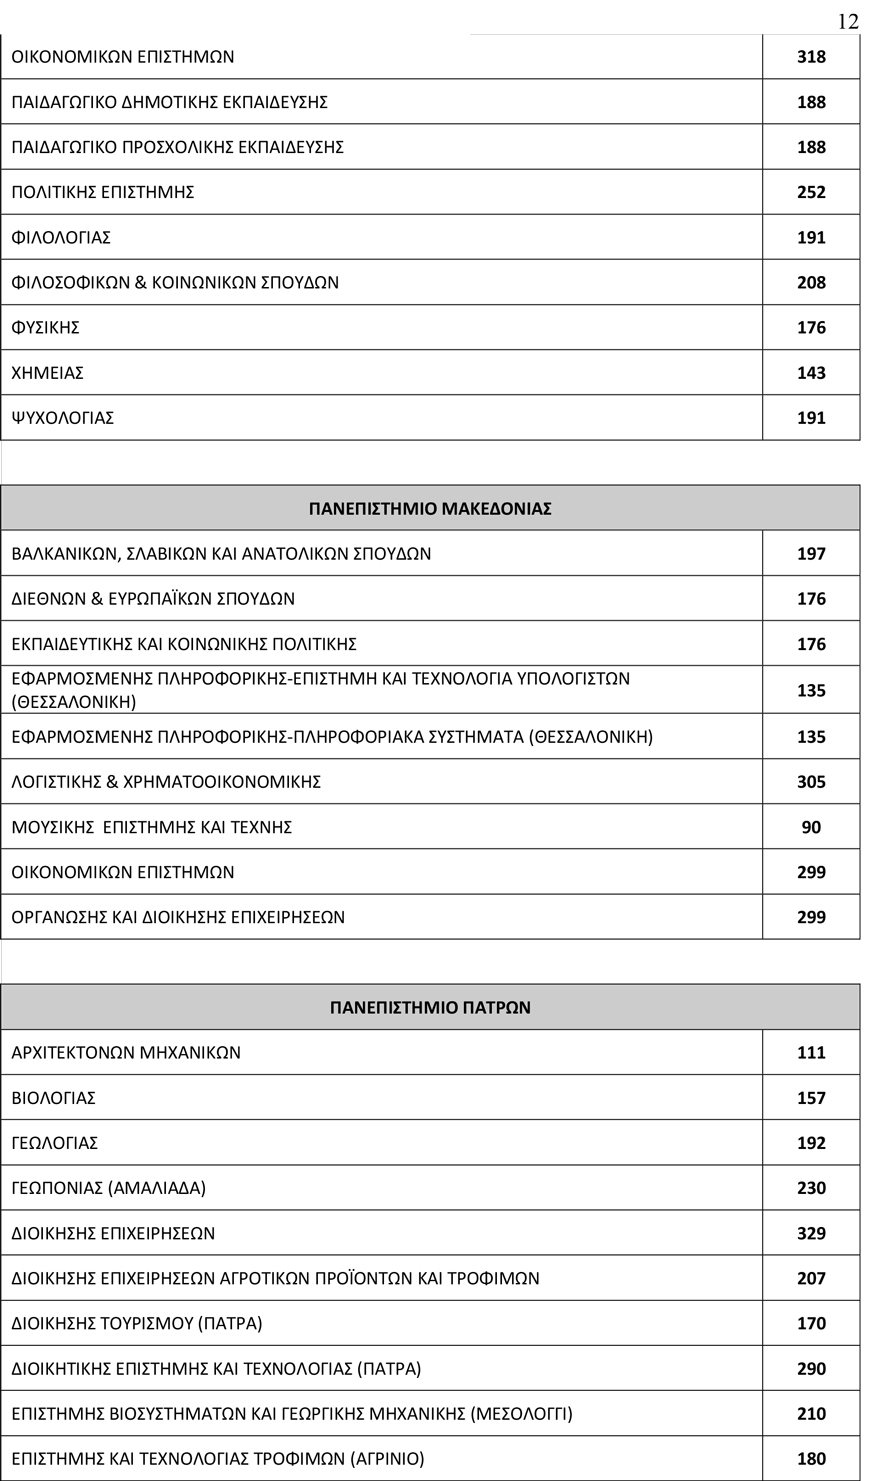 arrithmos_eisakt12 78.335 θα εισαχθούν φέτος στα Πανεπιστήμια - Αυξημένος κατά 3.500 ο αριθμός